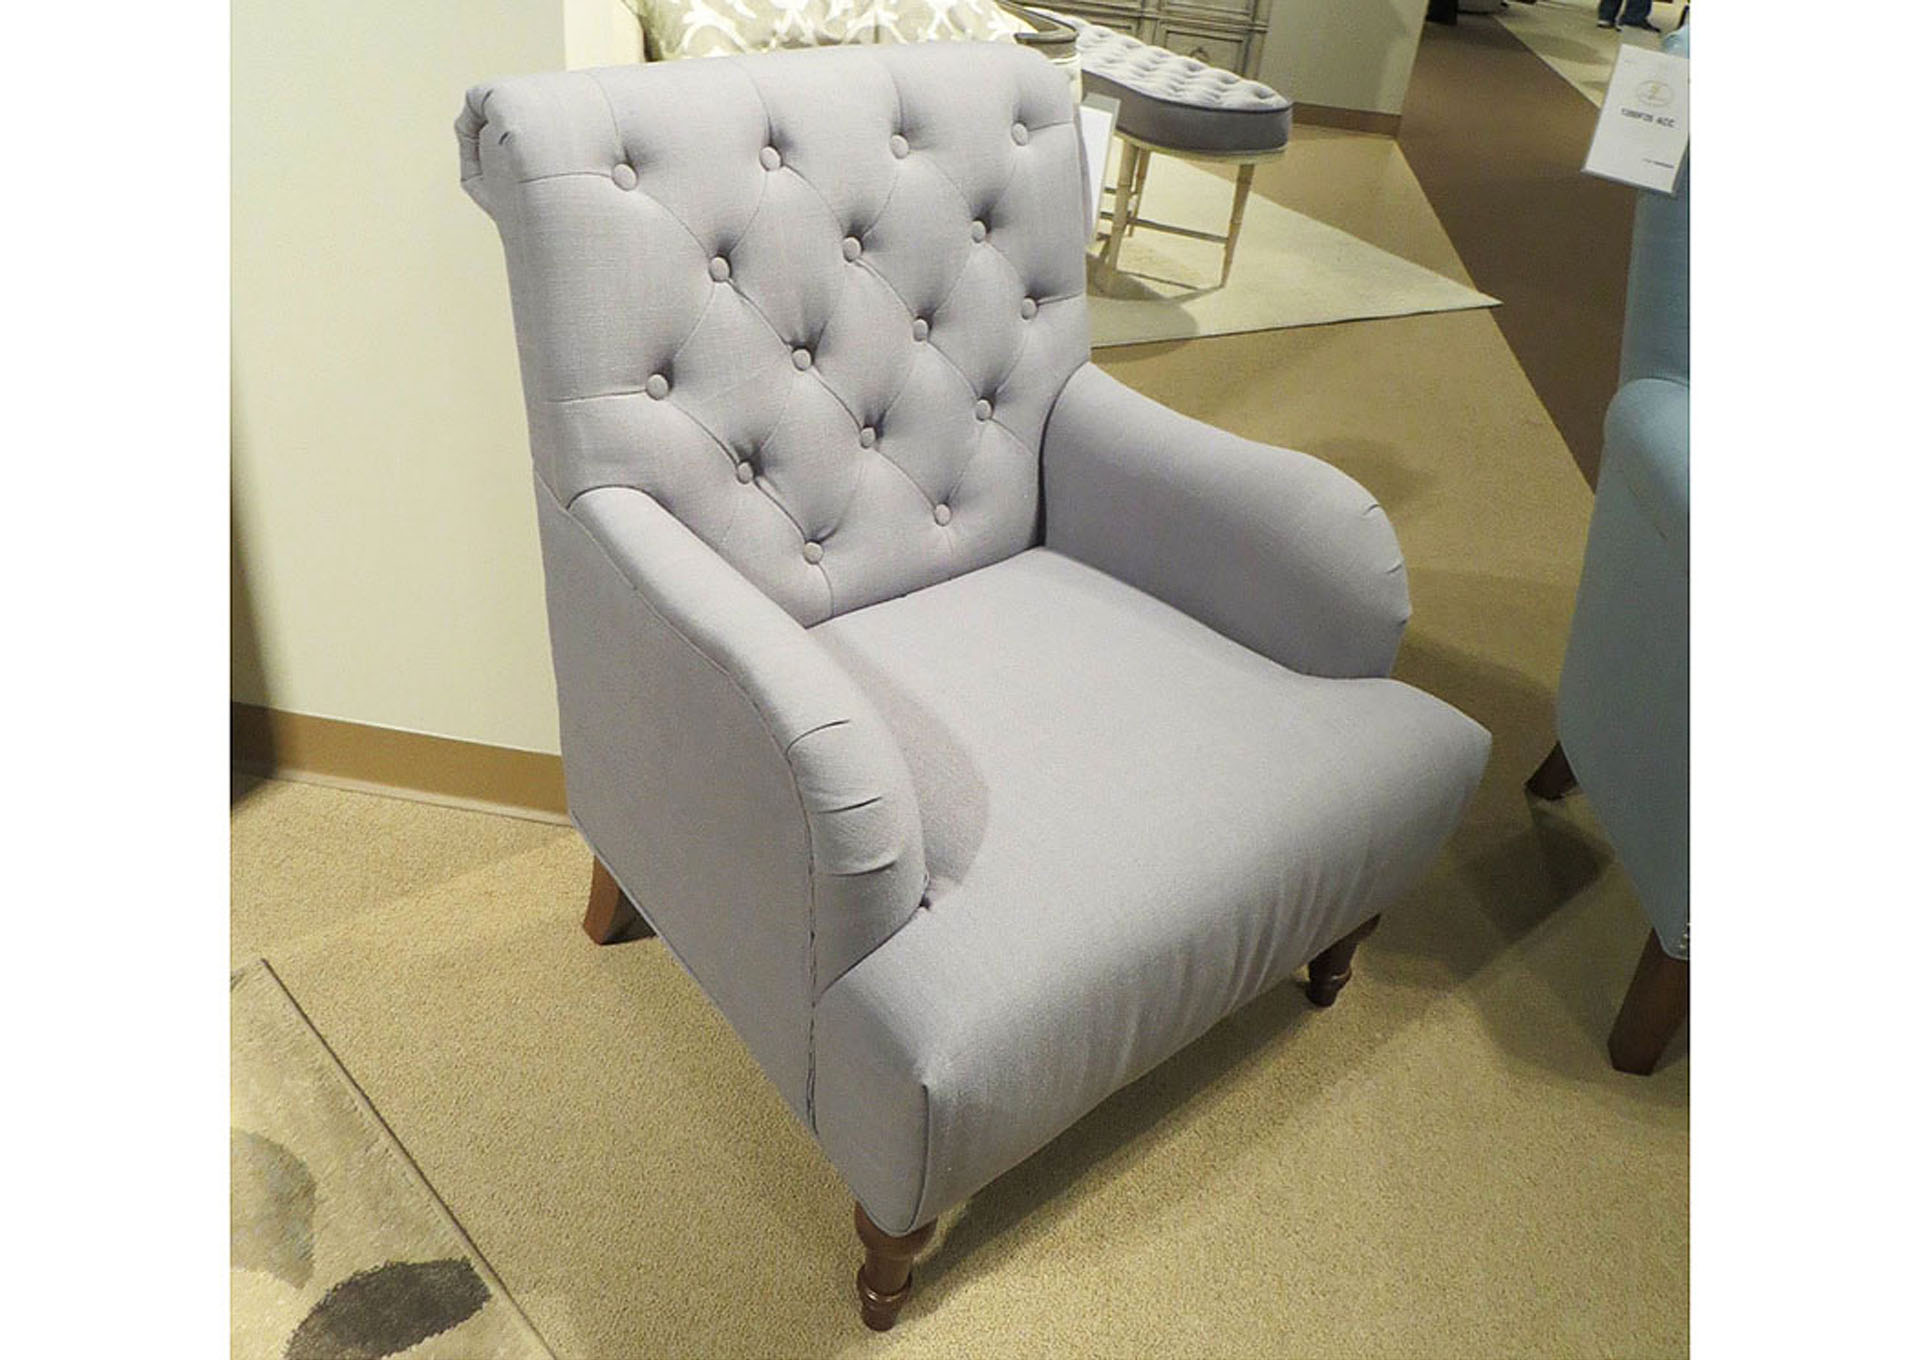 Discount Home Furniture And Kidu0027s Furniture In Trumbull, CT